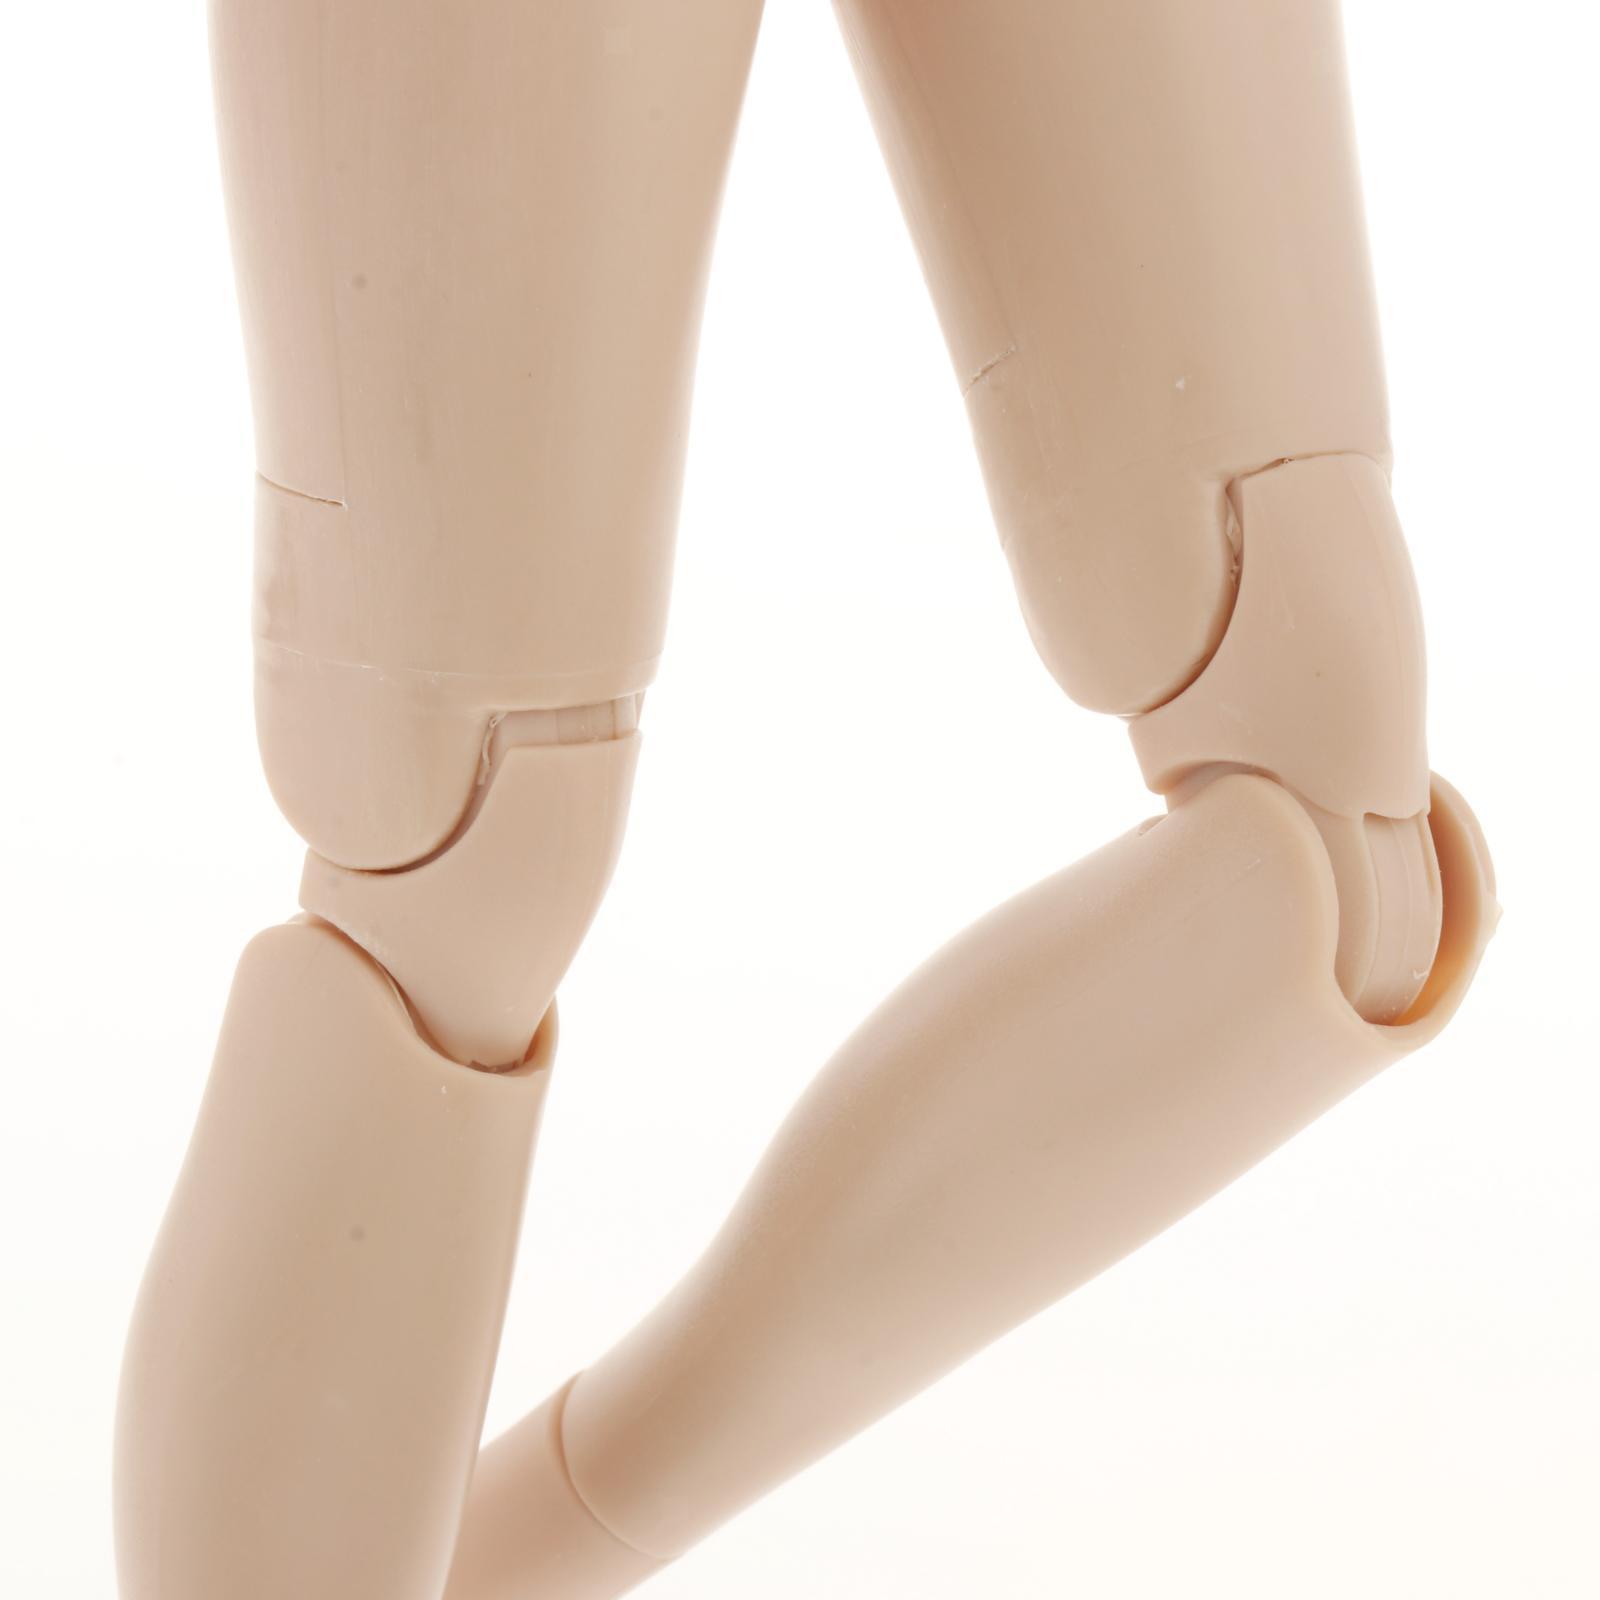 miniature 5 - 1/6 Scale Female Flexible Body 12 Inches Action Figure Body Seamless Figure